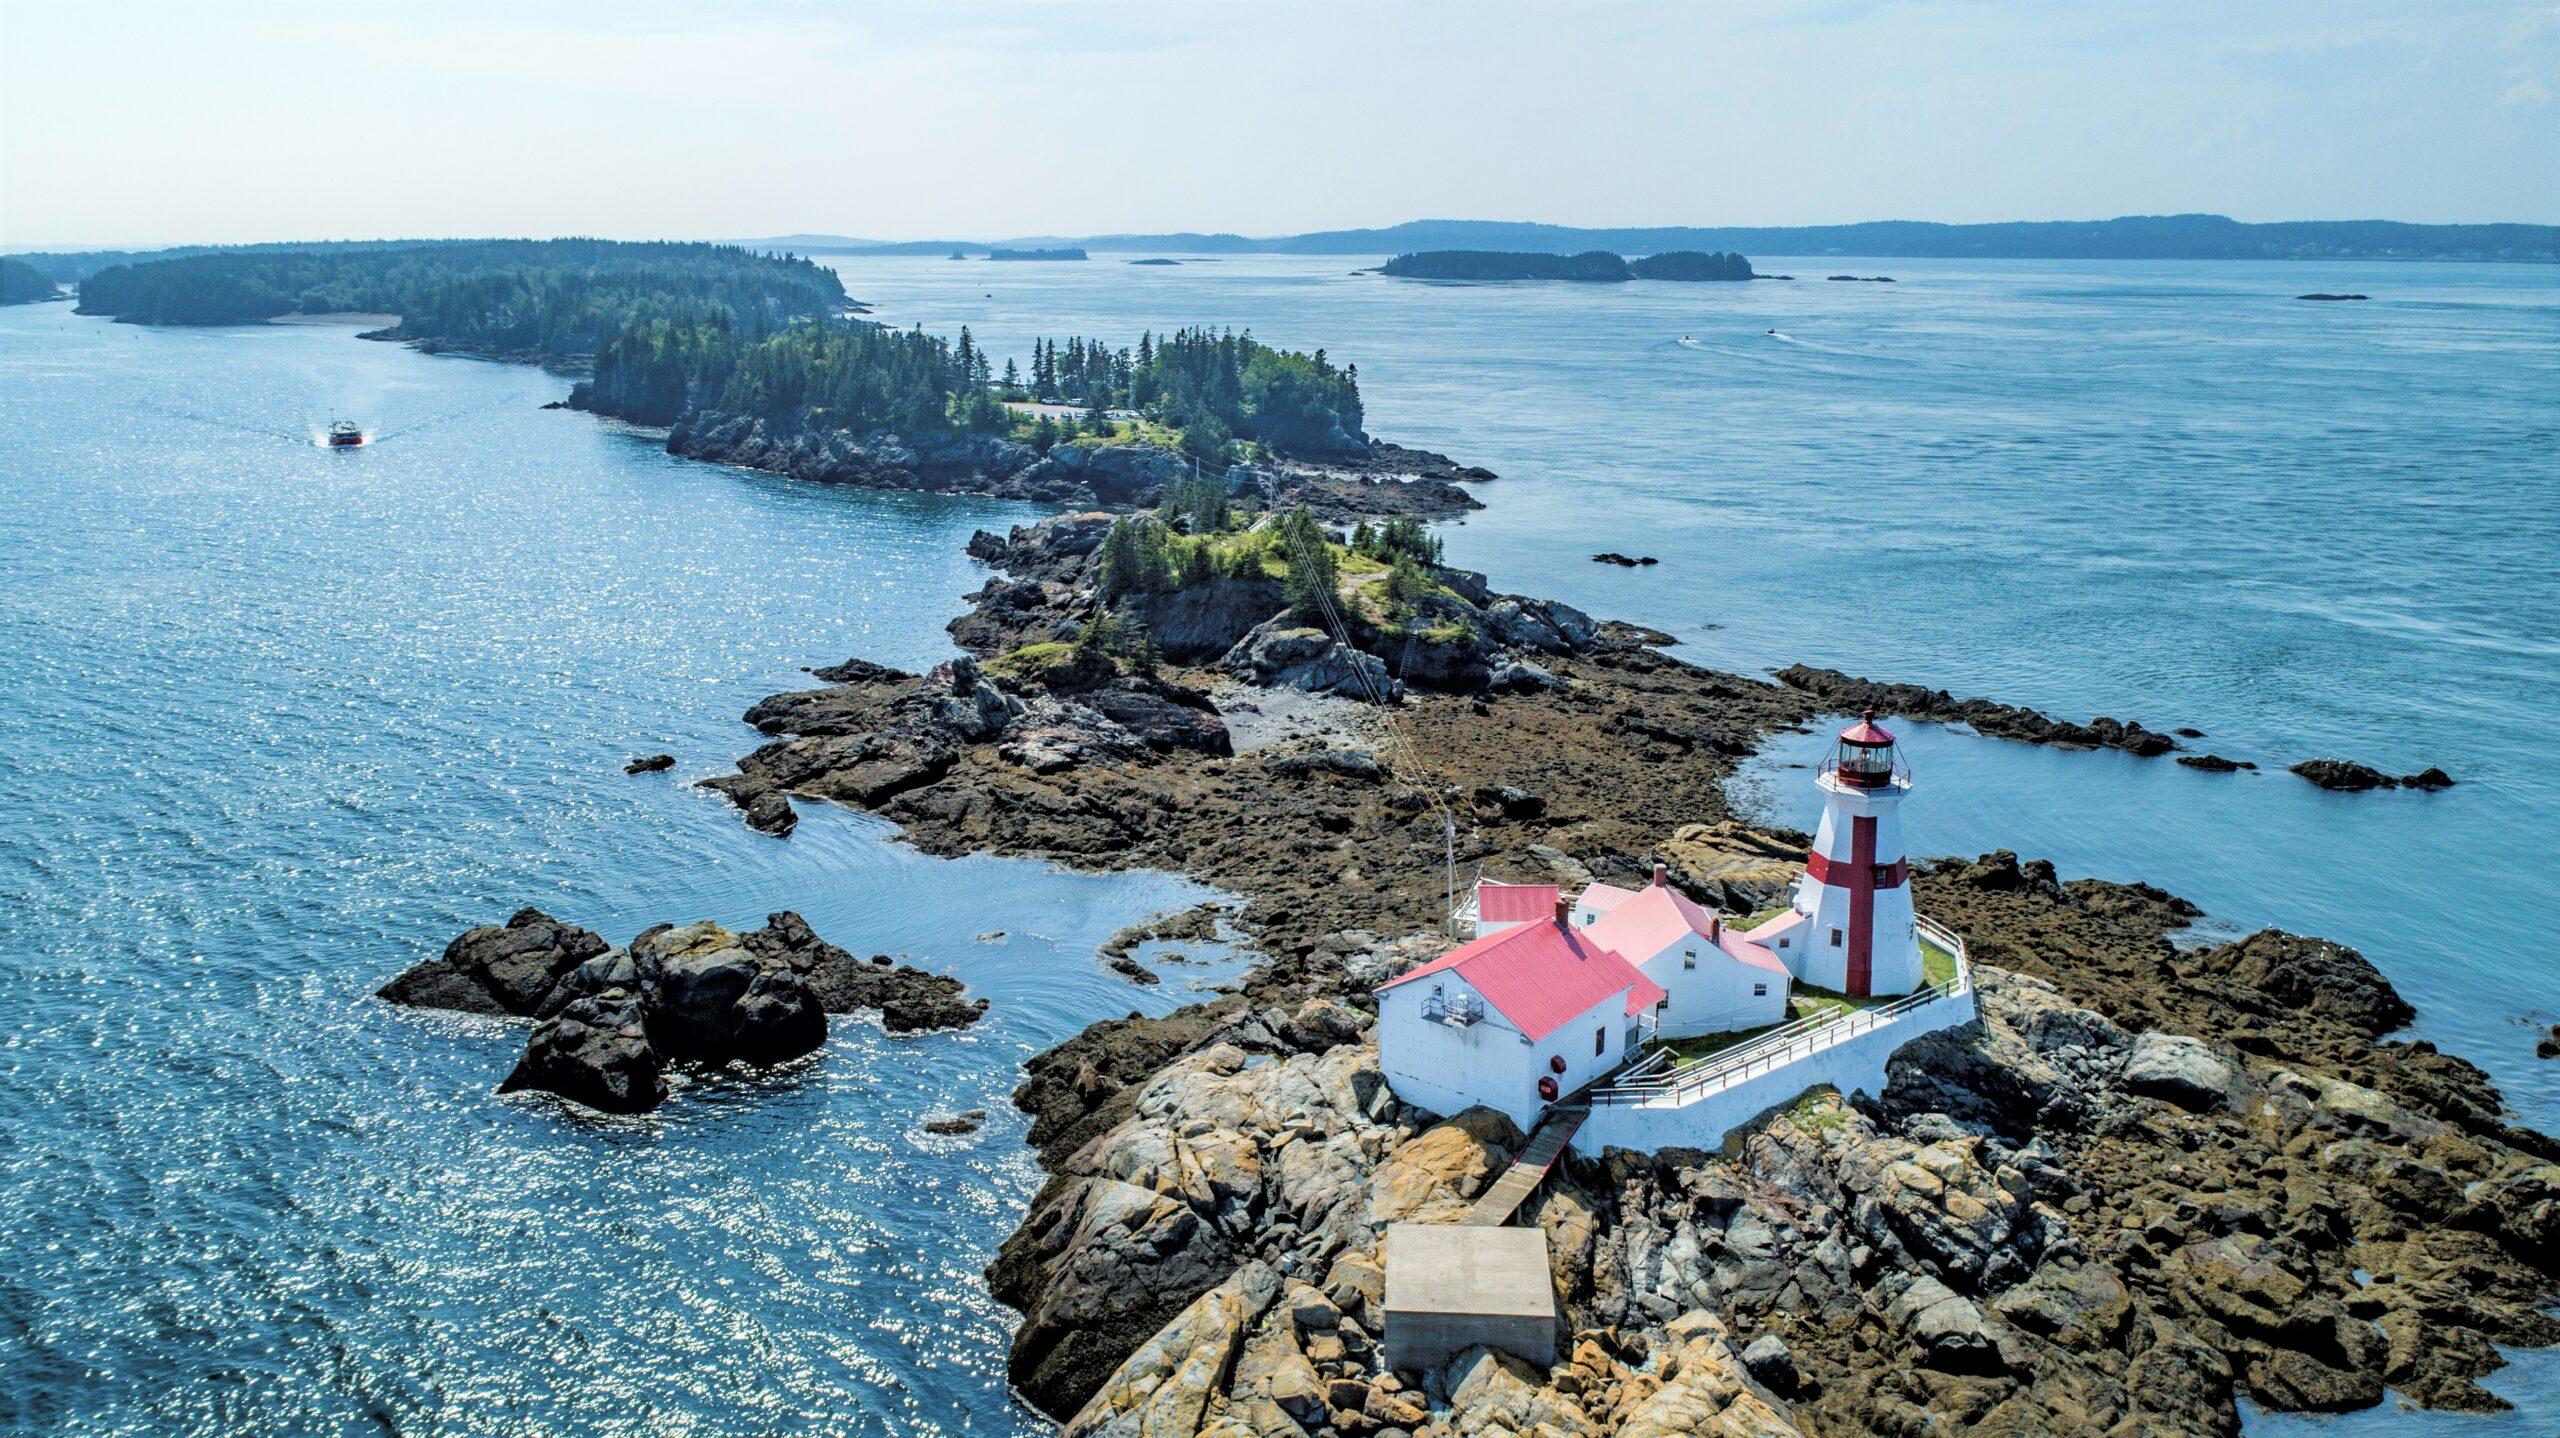 Head-Harbor-Light-East-Quoddy-Lighthouse-NB.-Campobello-Island-Canada-Altitude-3-1-1